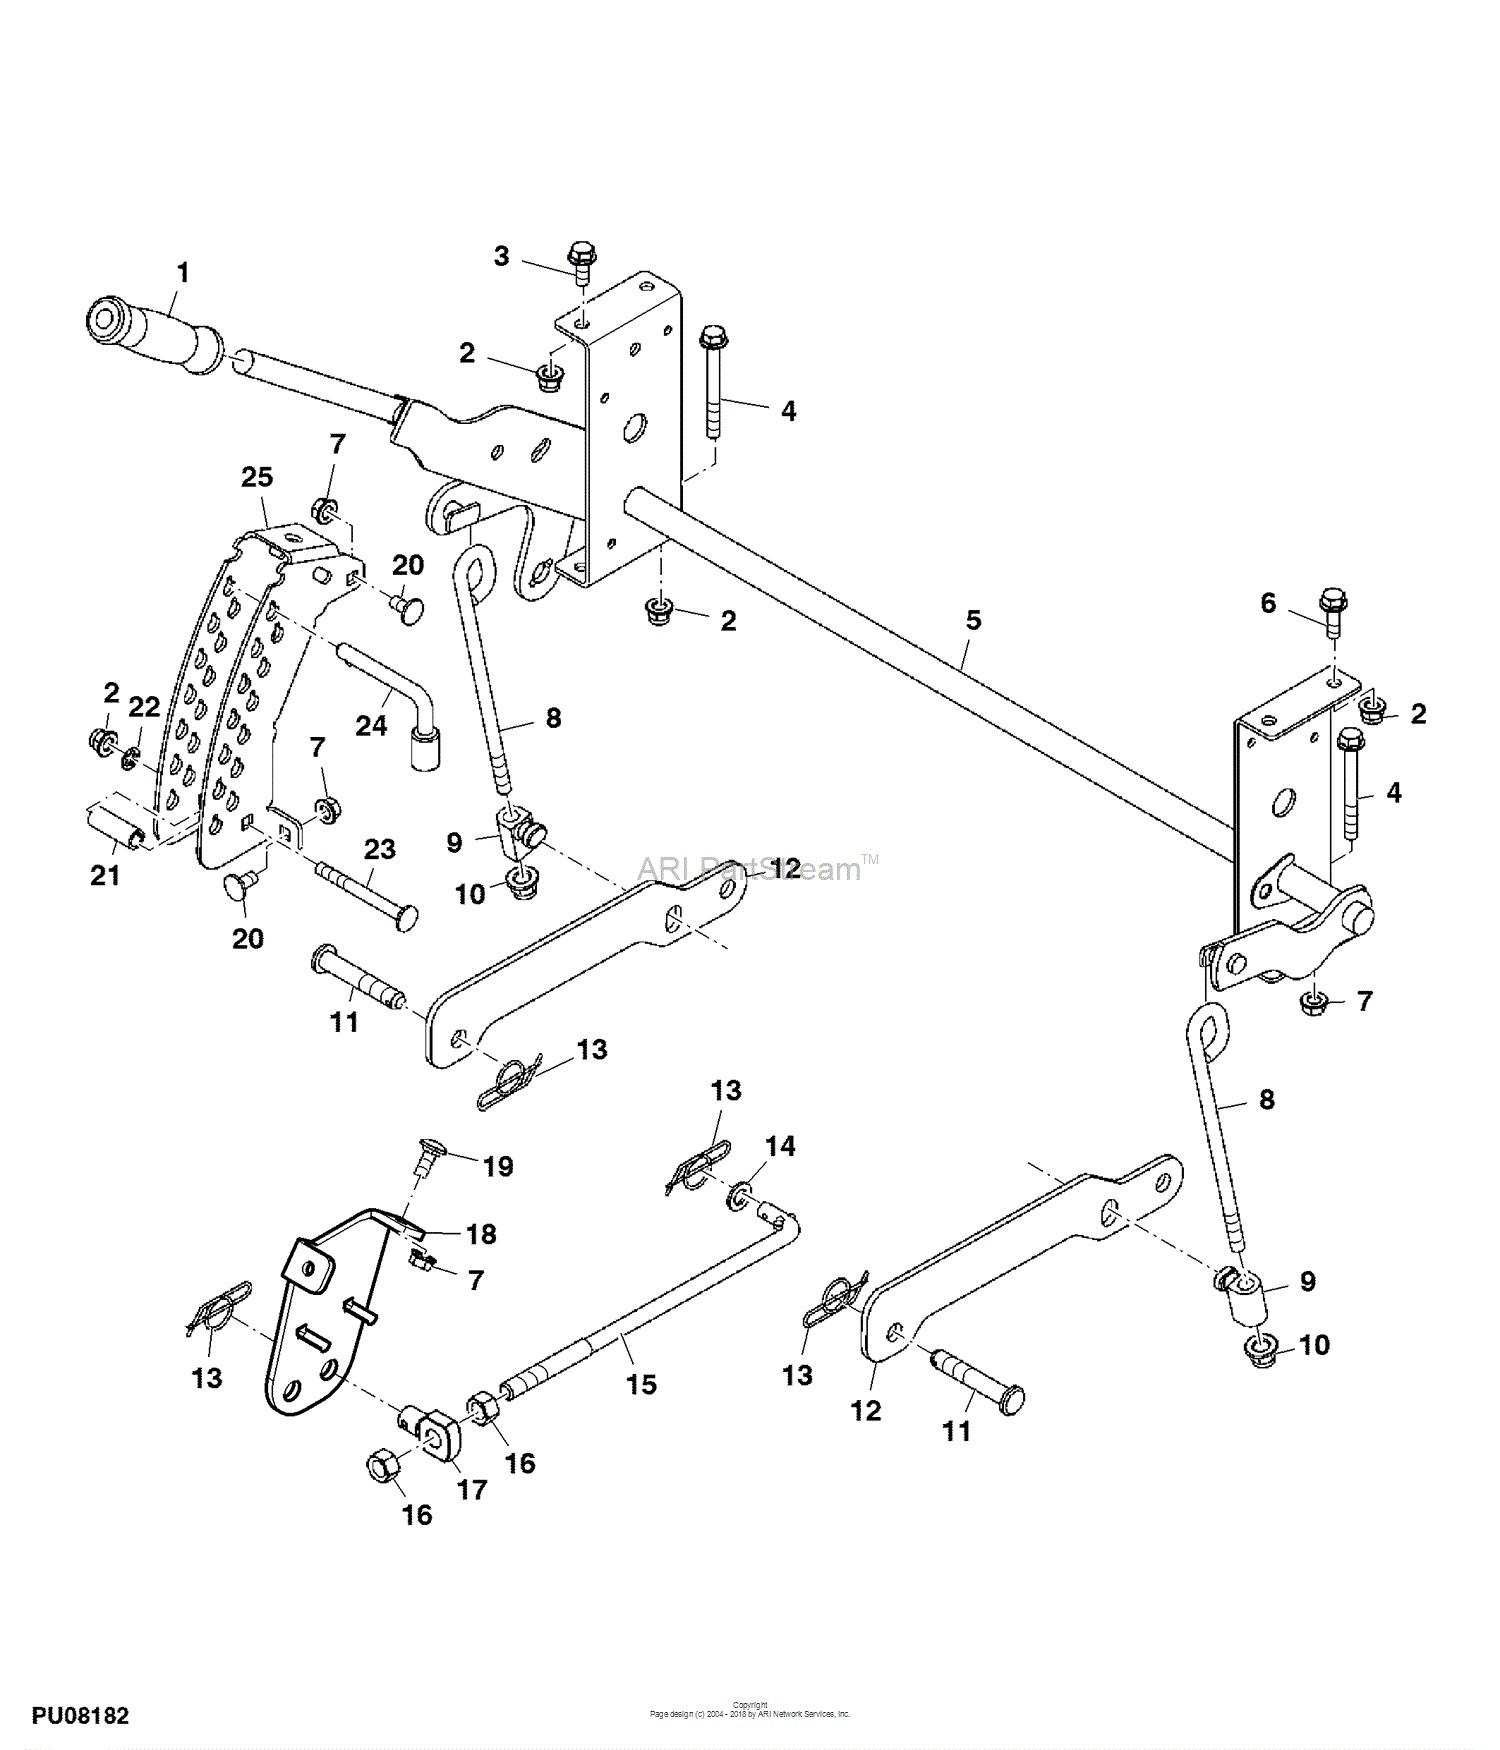 John Deere 717 Wiring Diagram